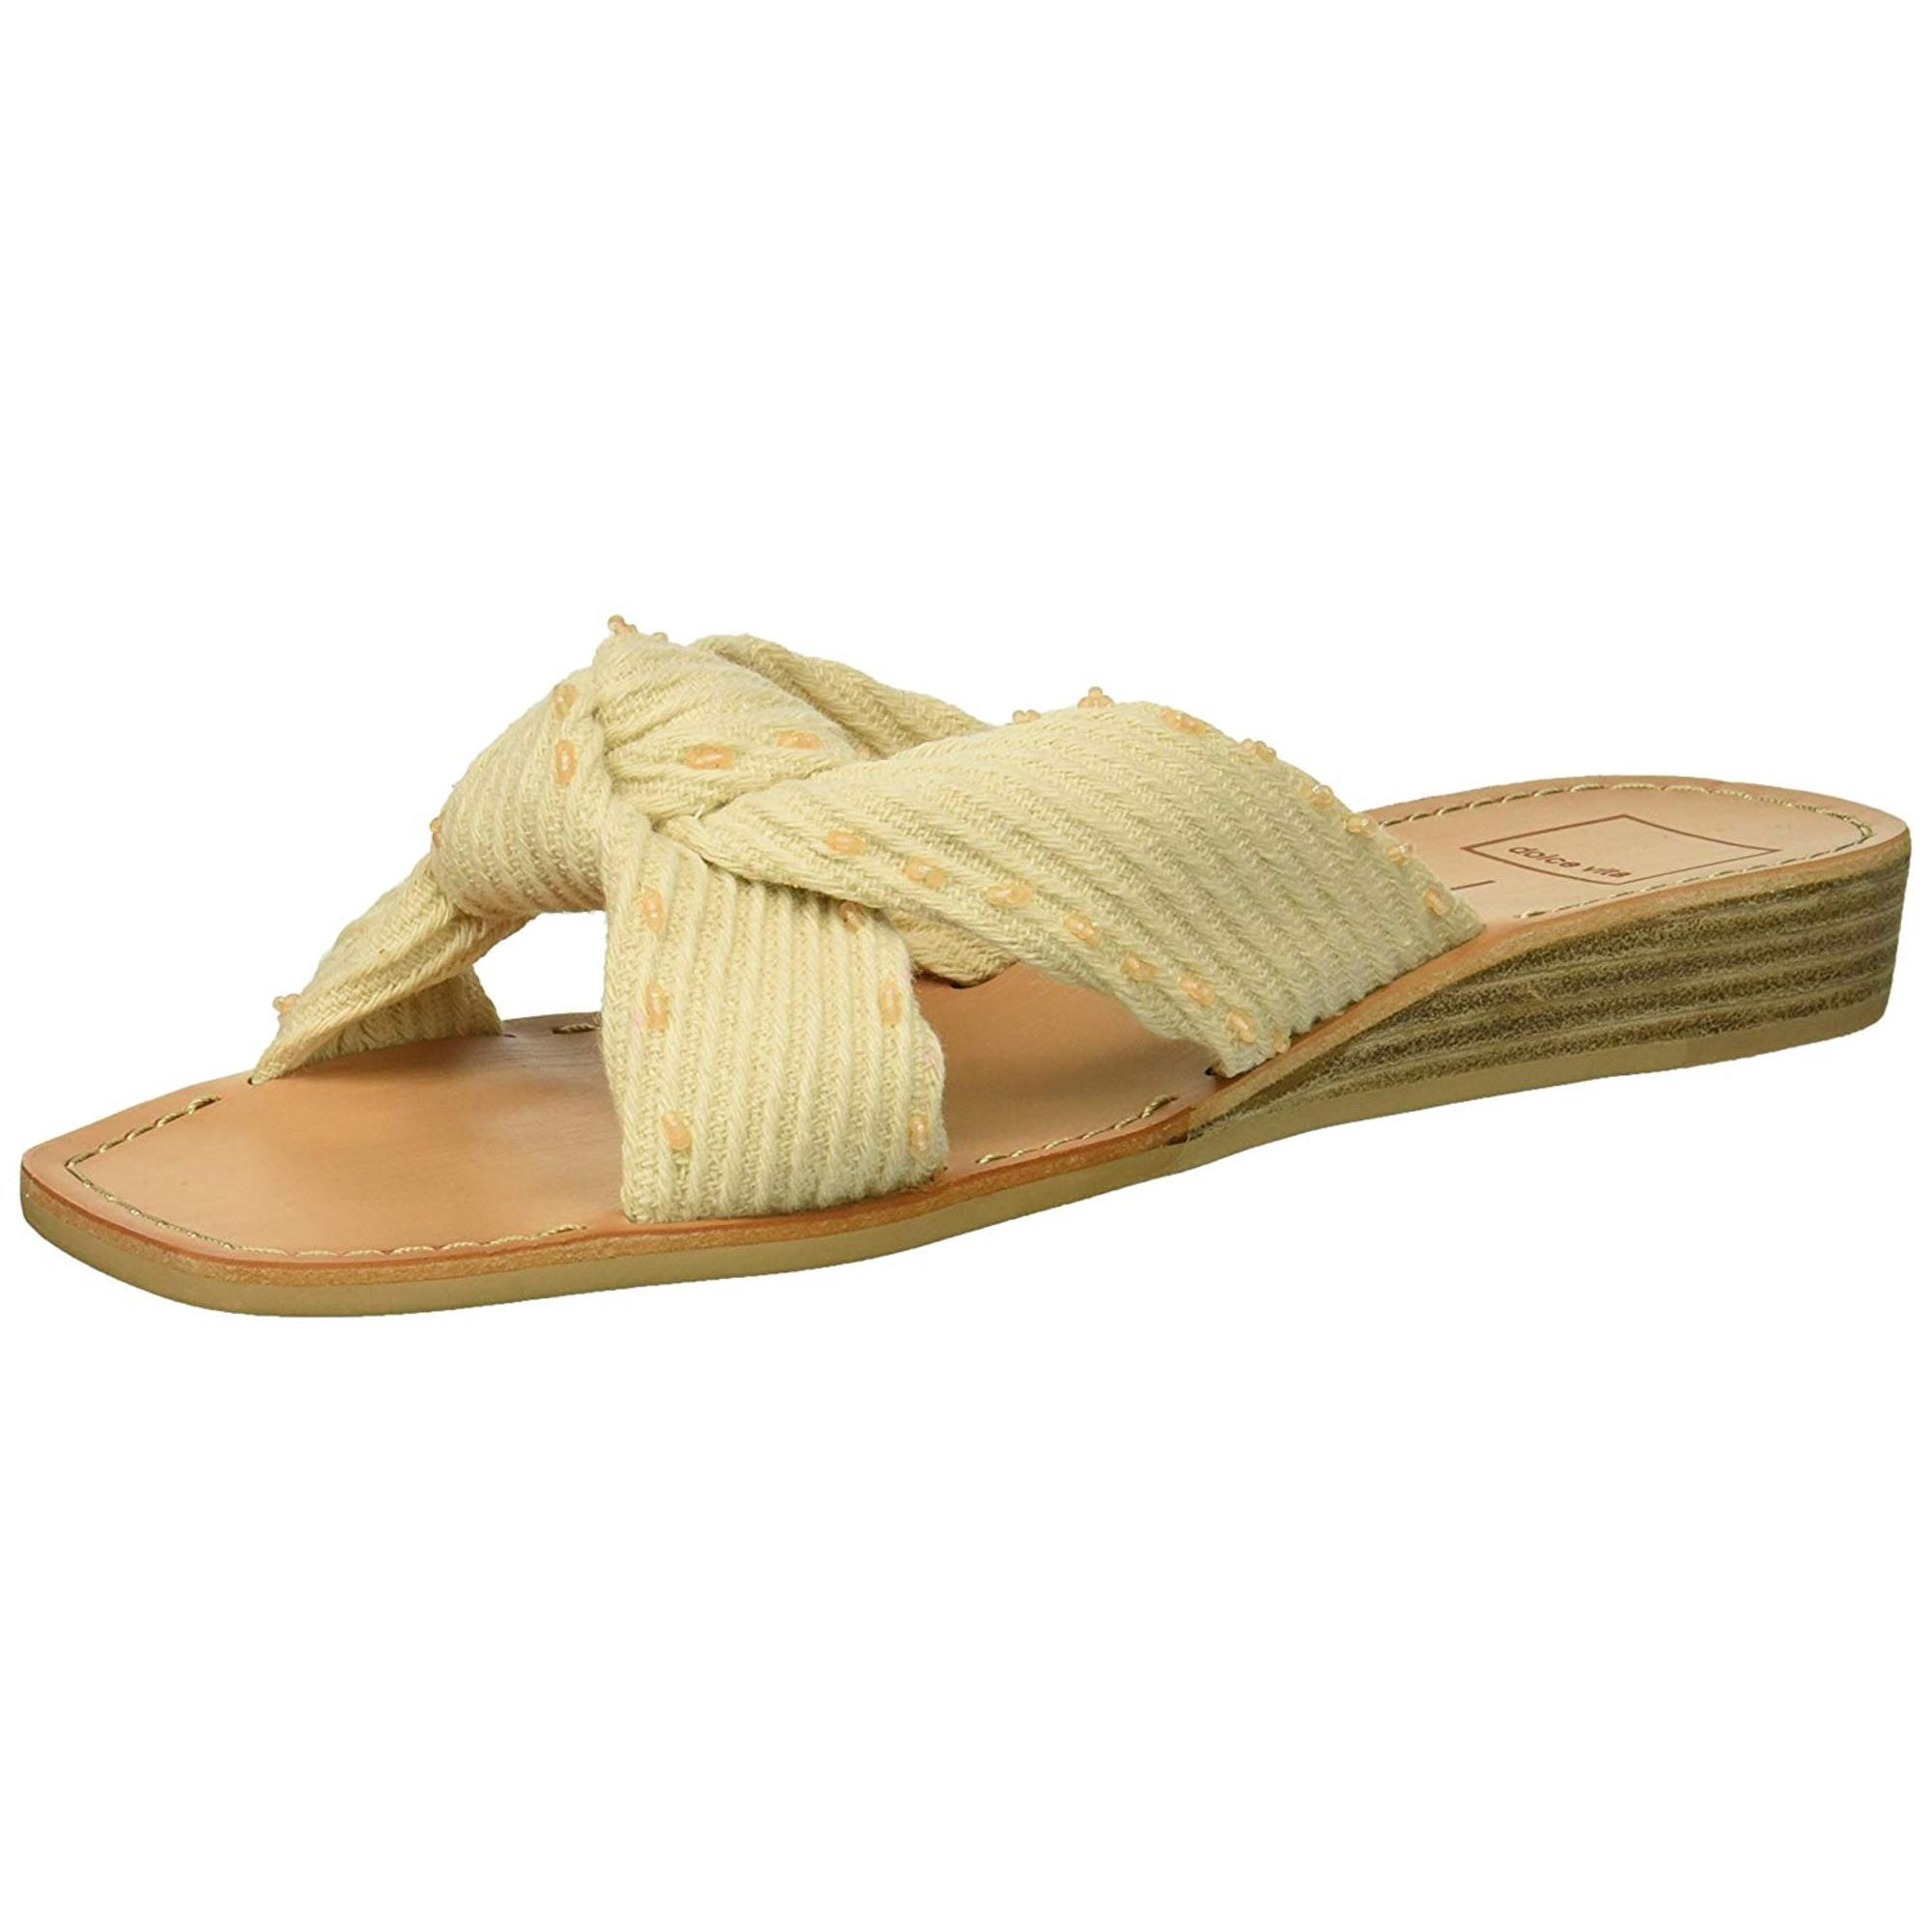 33a539f01 Dolce Vita Womens havva Open Toe Casual Slide Sandals | Walmart Canada